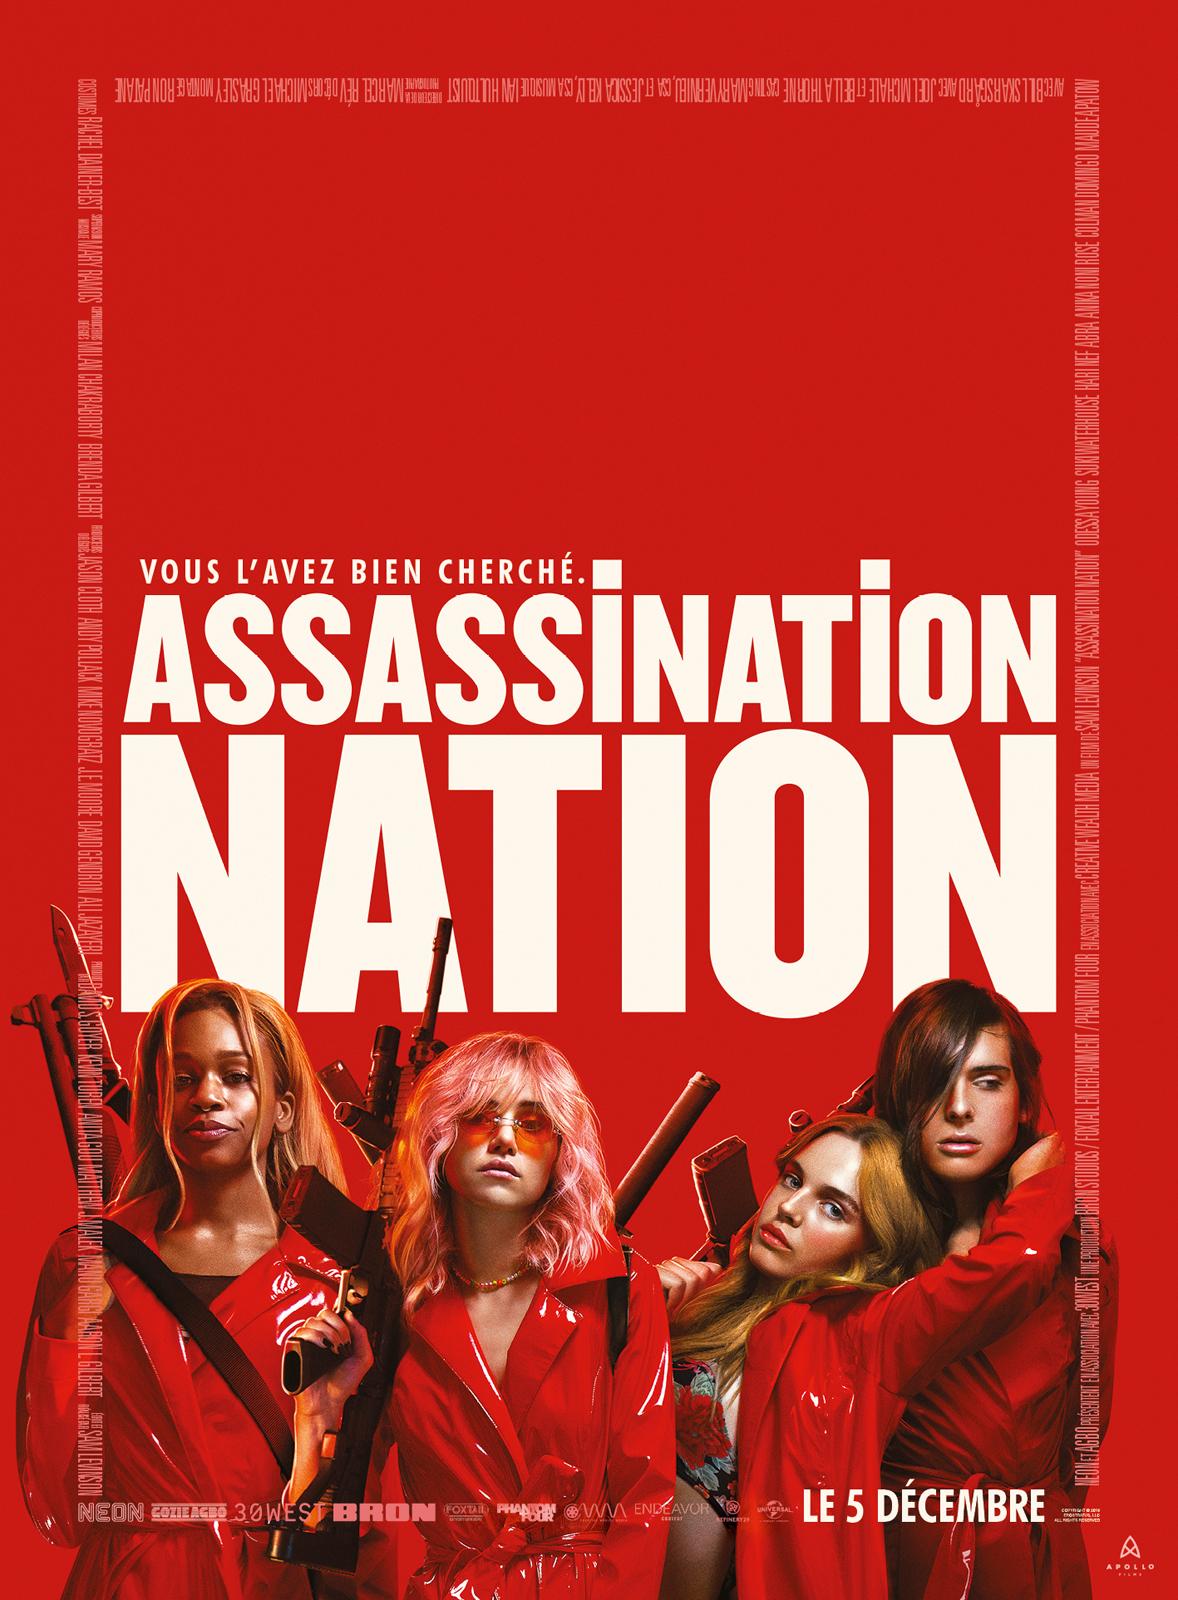 Assassination nation de Sam Levinson